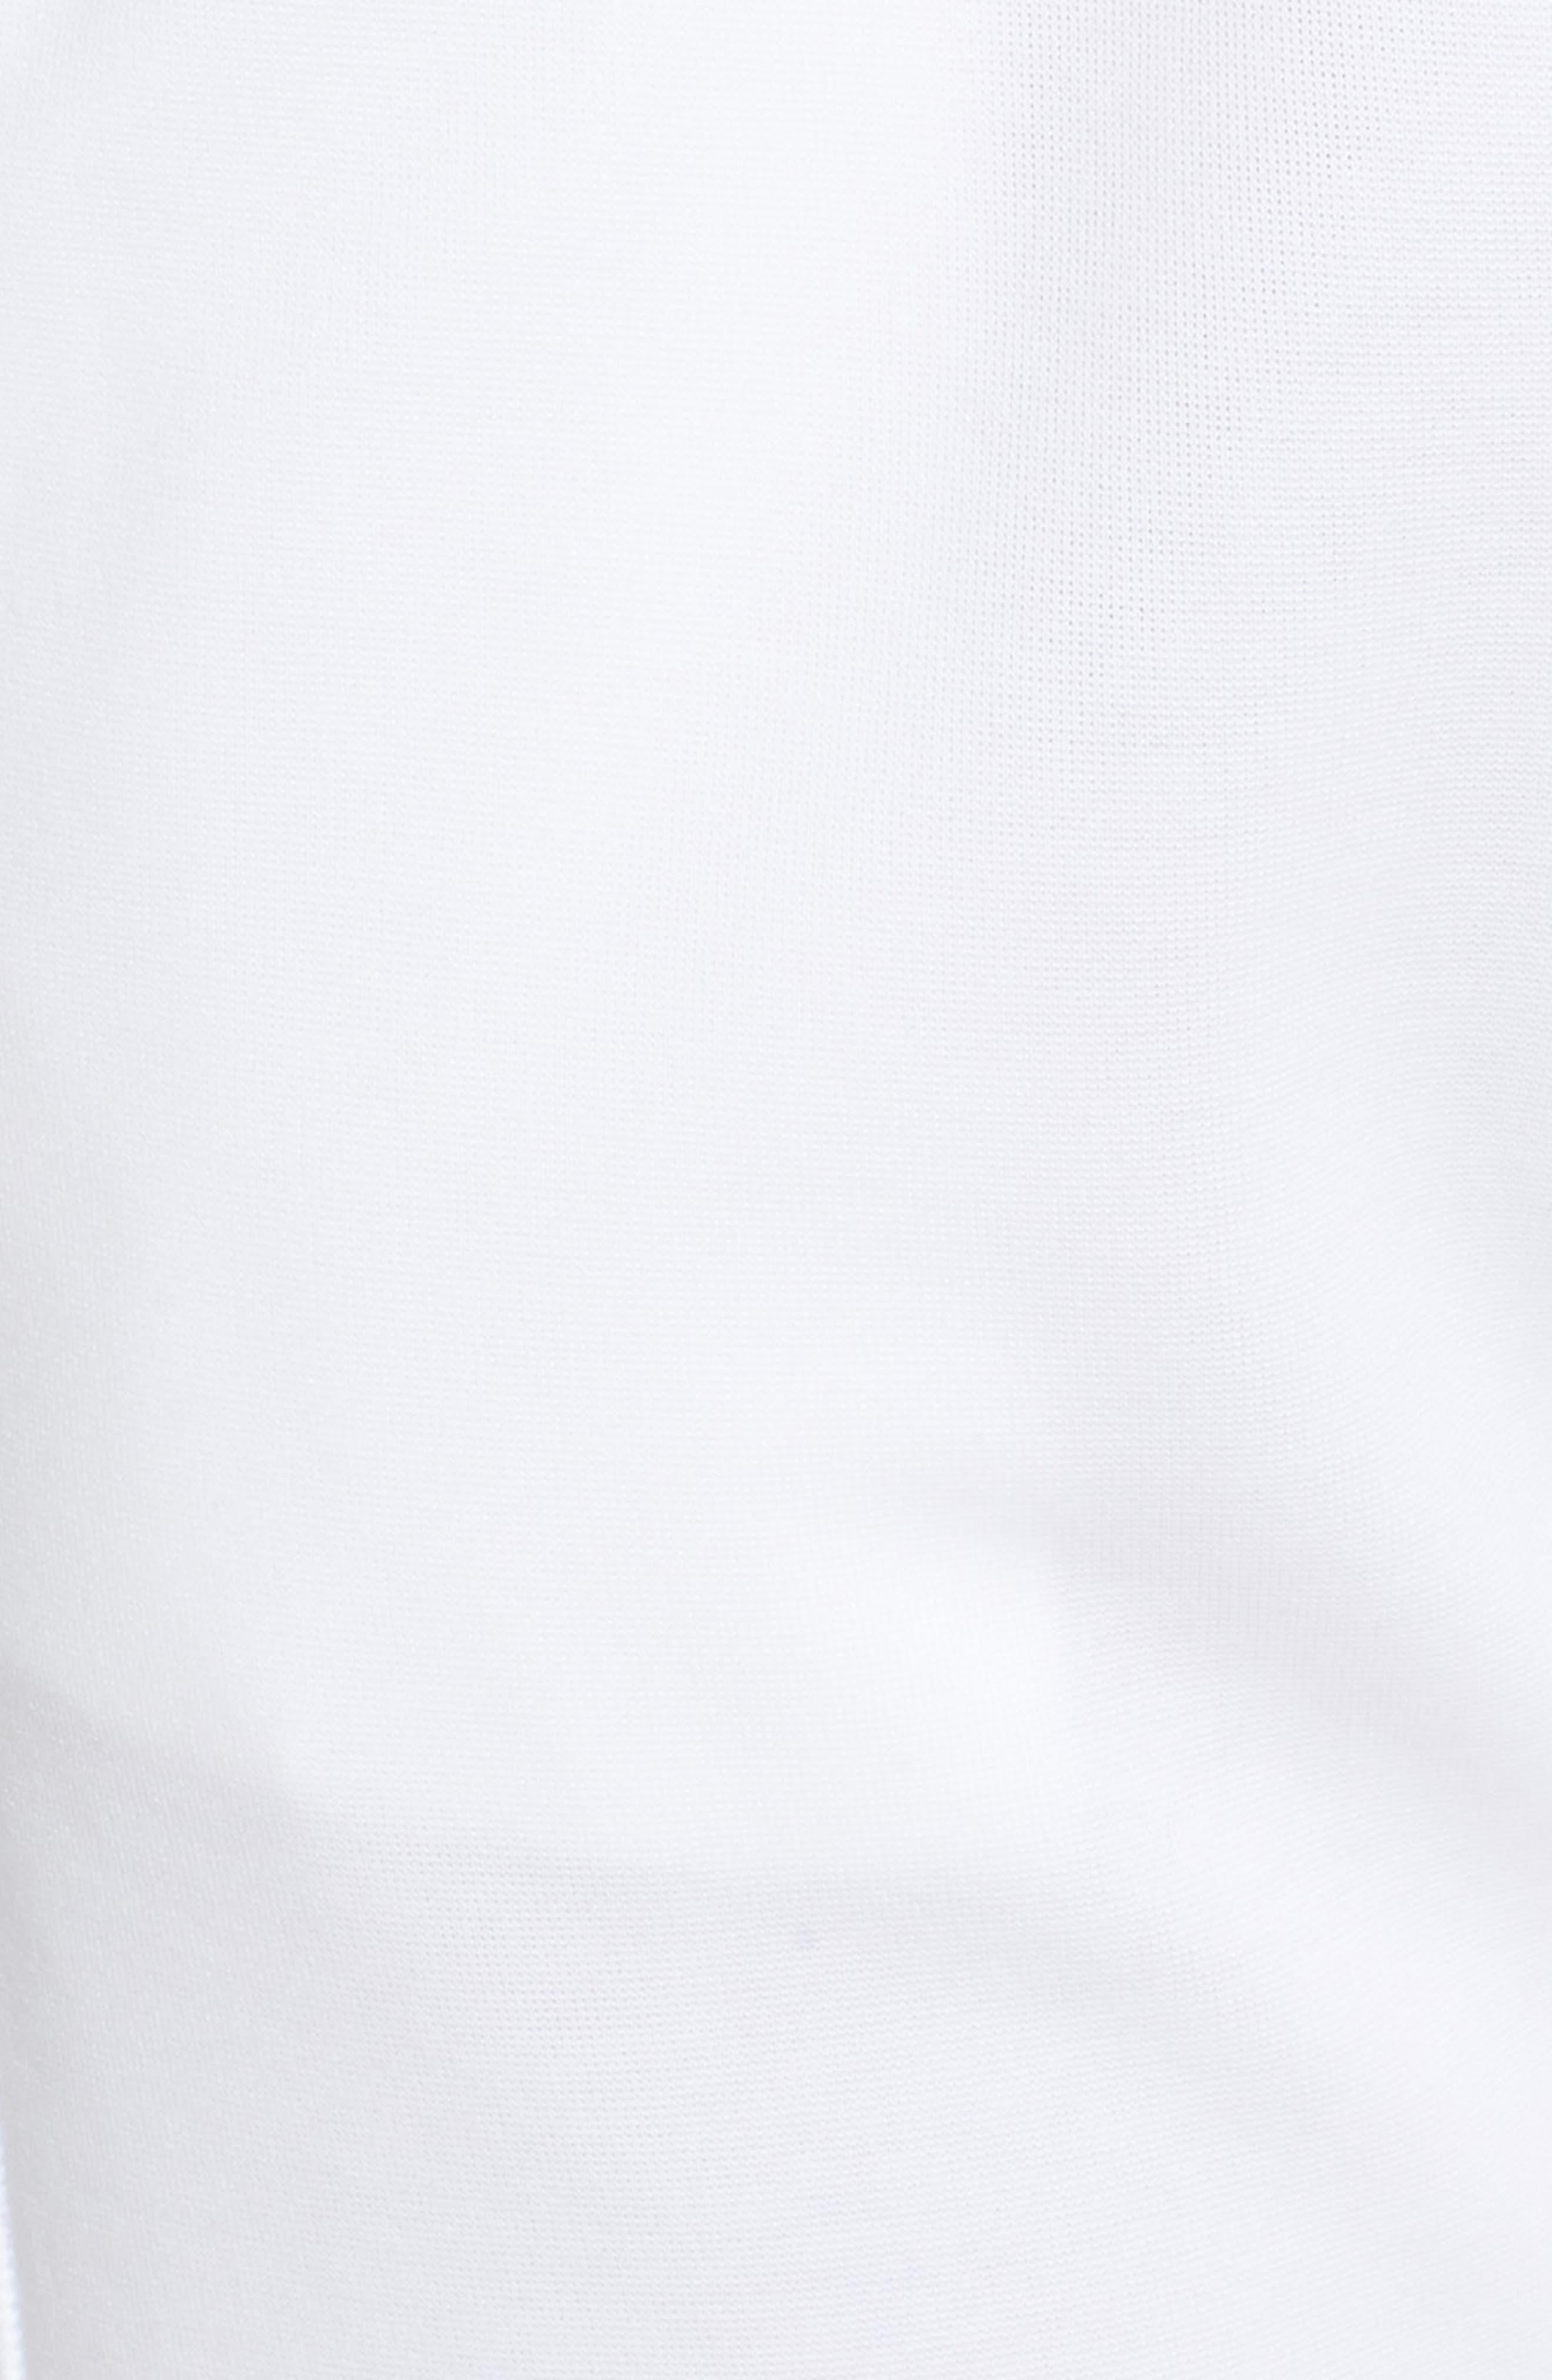 Sportswear Air Jogger Pants,                             Alternate thumbnail 6, color,                             WHITE/ ROSE GOLD/ BLACK